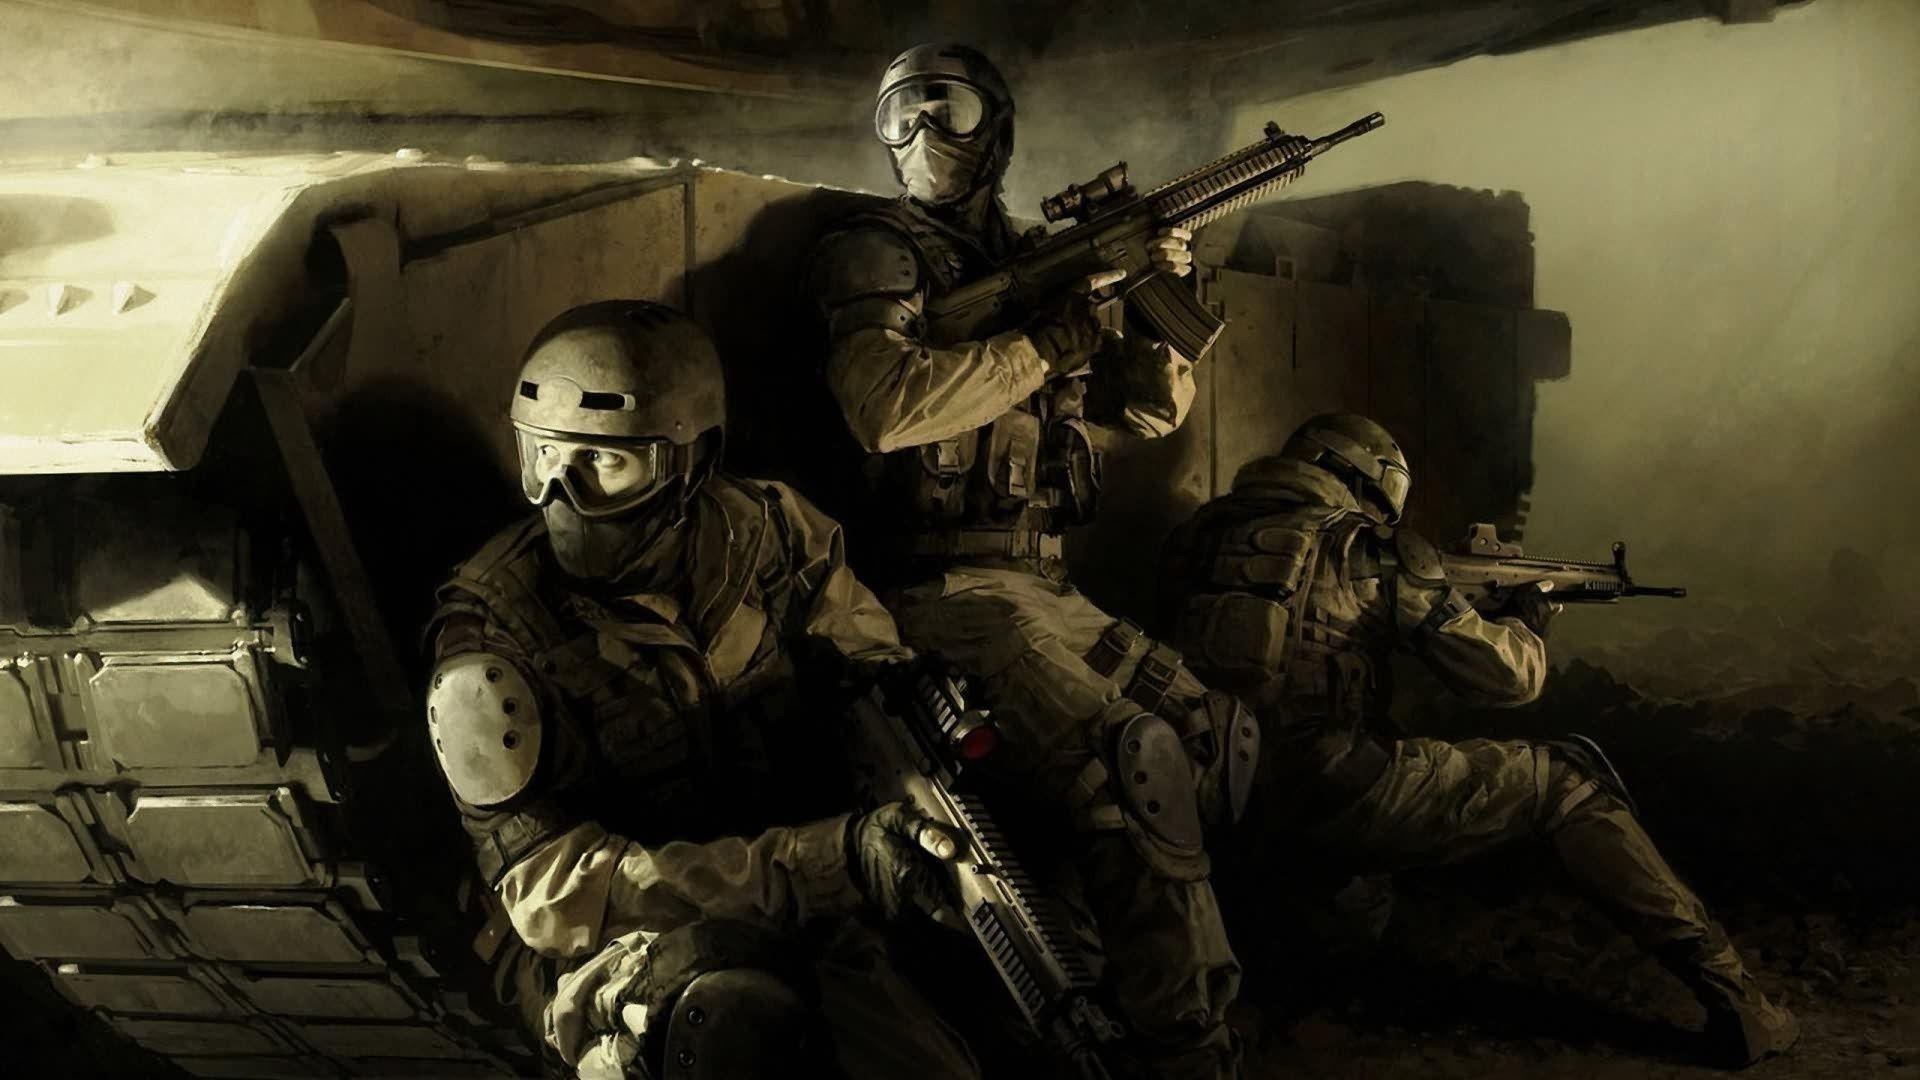 Res: 1920x1080, Swat Team Wallpaper (67+ images)